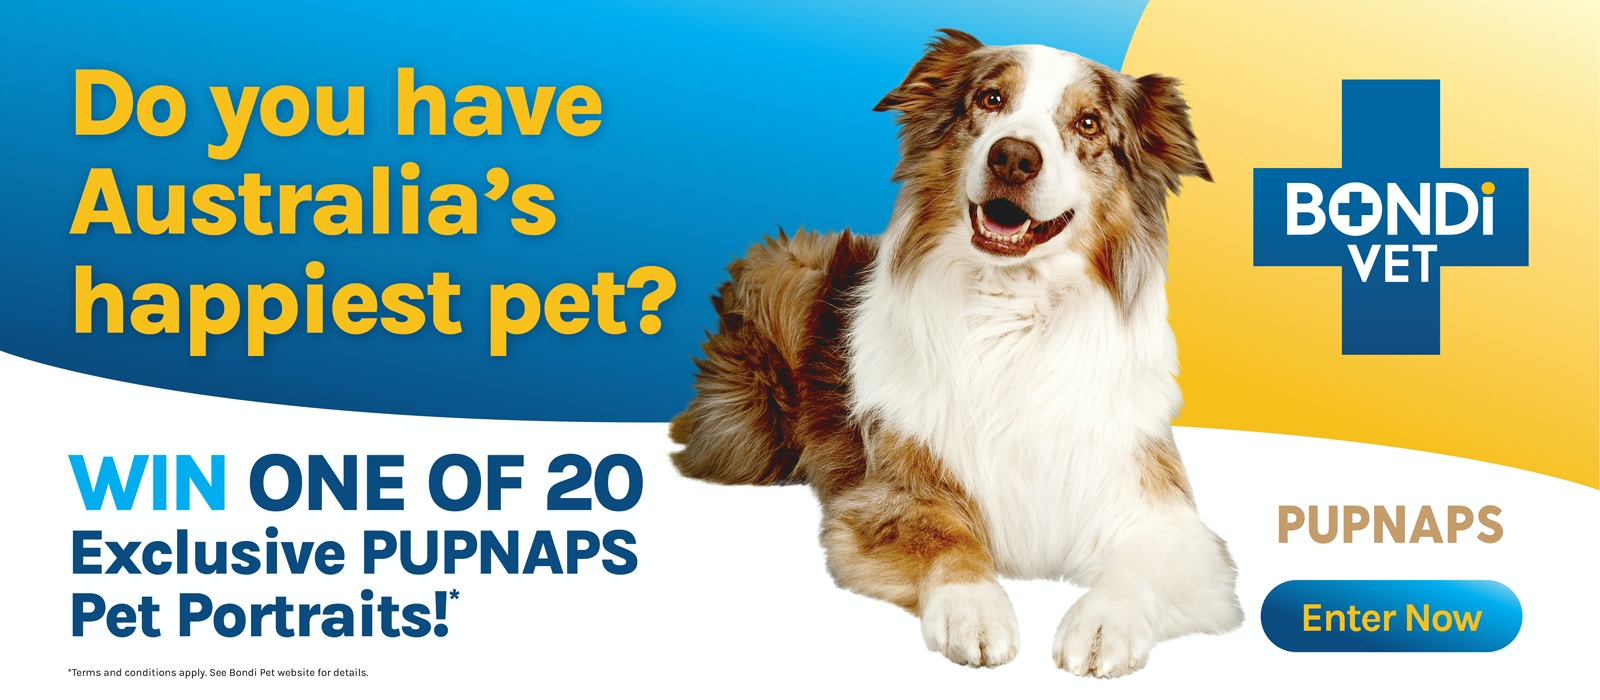 Bondi Vet Happy Pet competition Australia